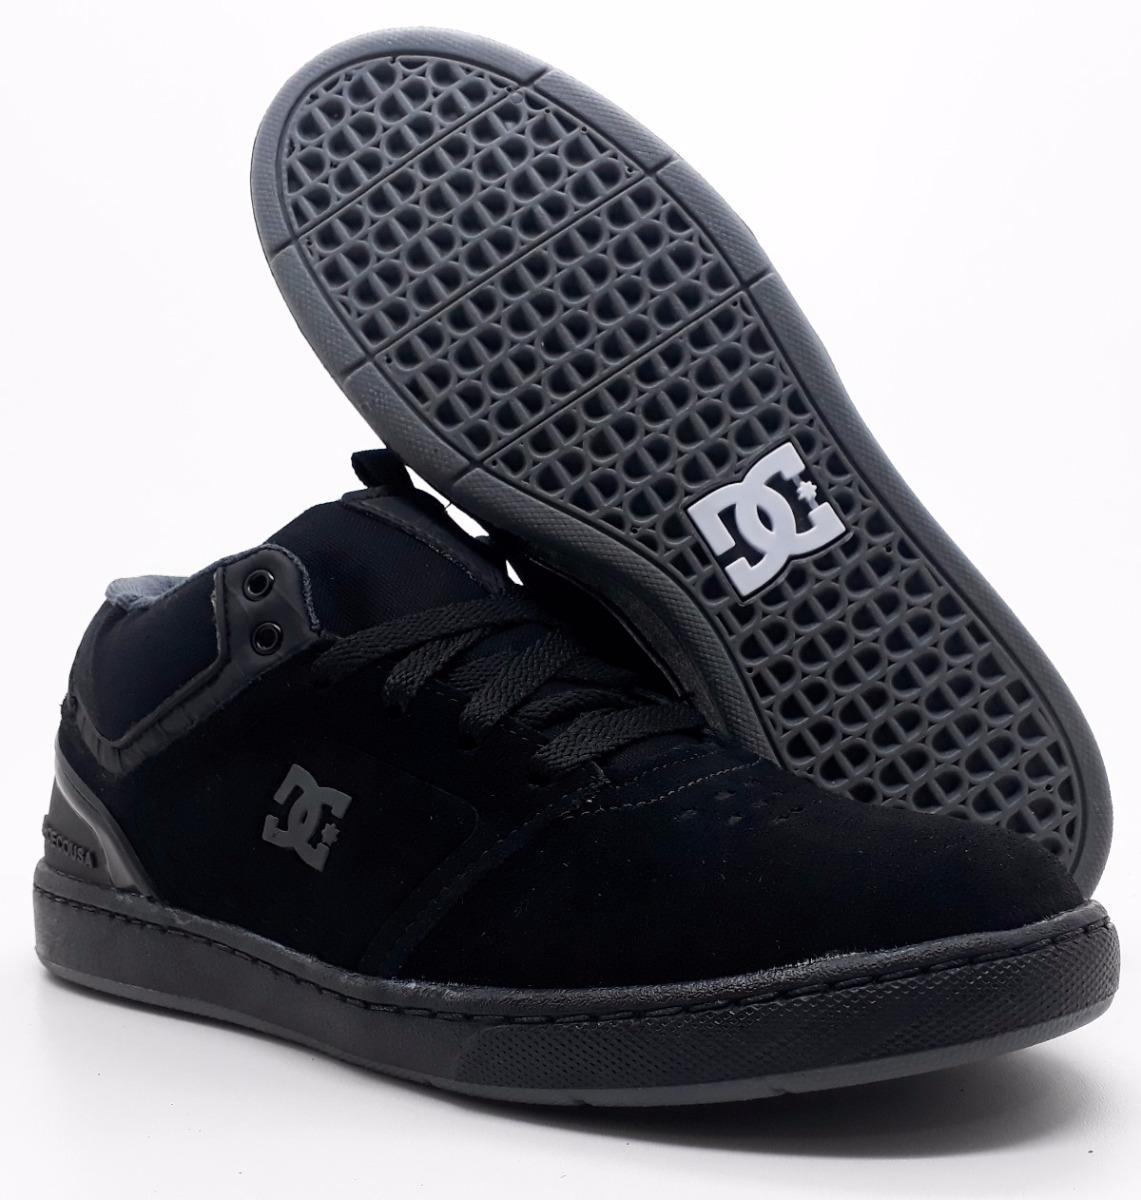 d4367aa76 Tênis Dc Shoes Skate Cole Signature Bota - LeveShoes